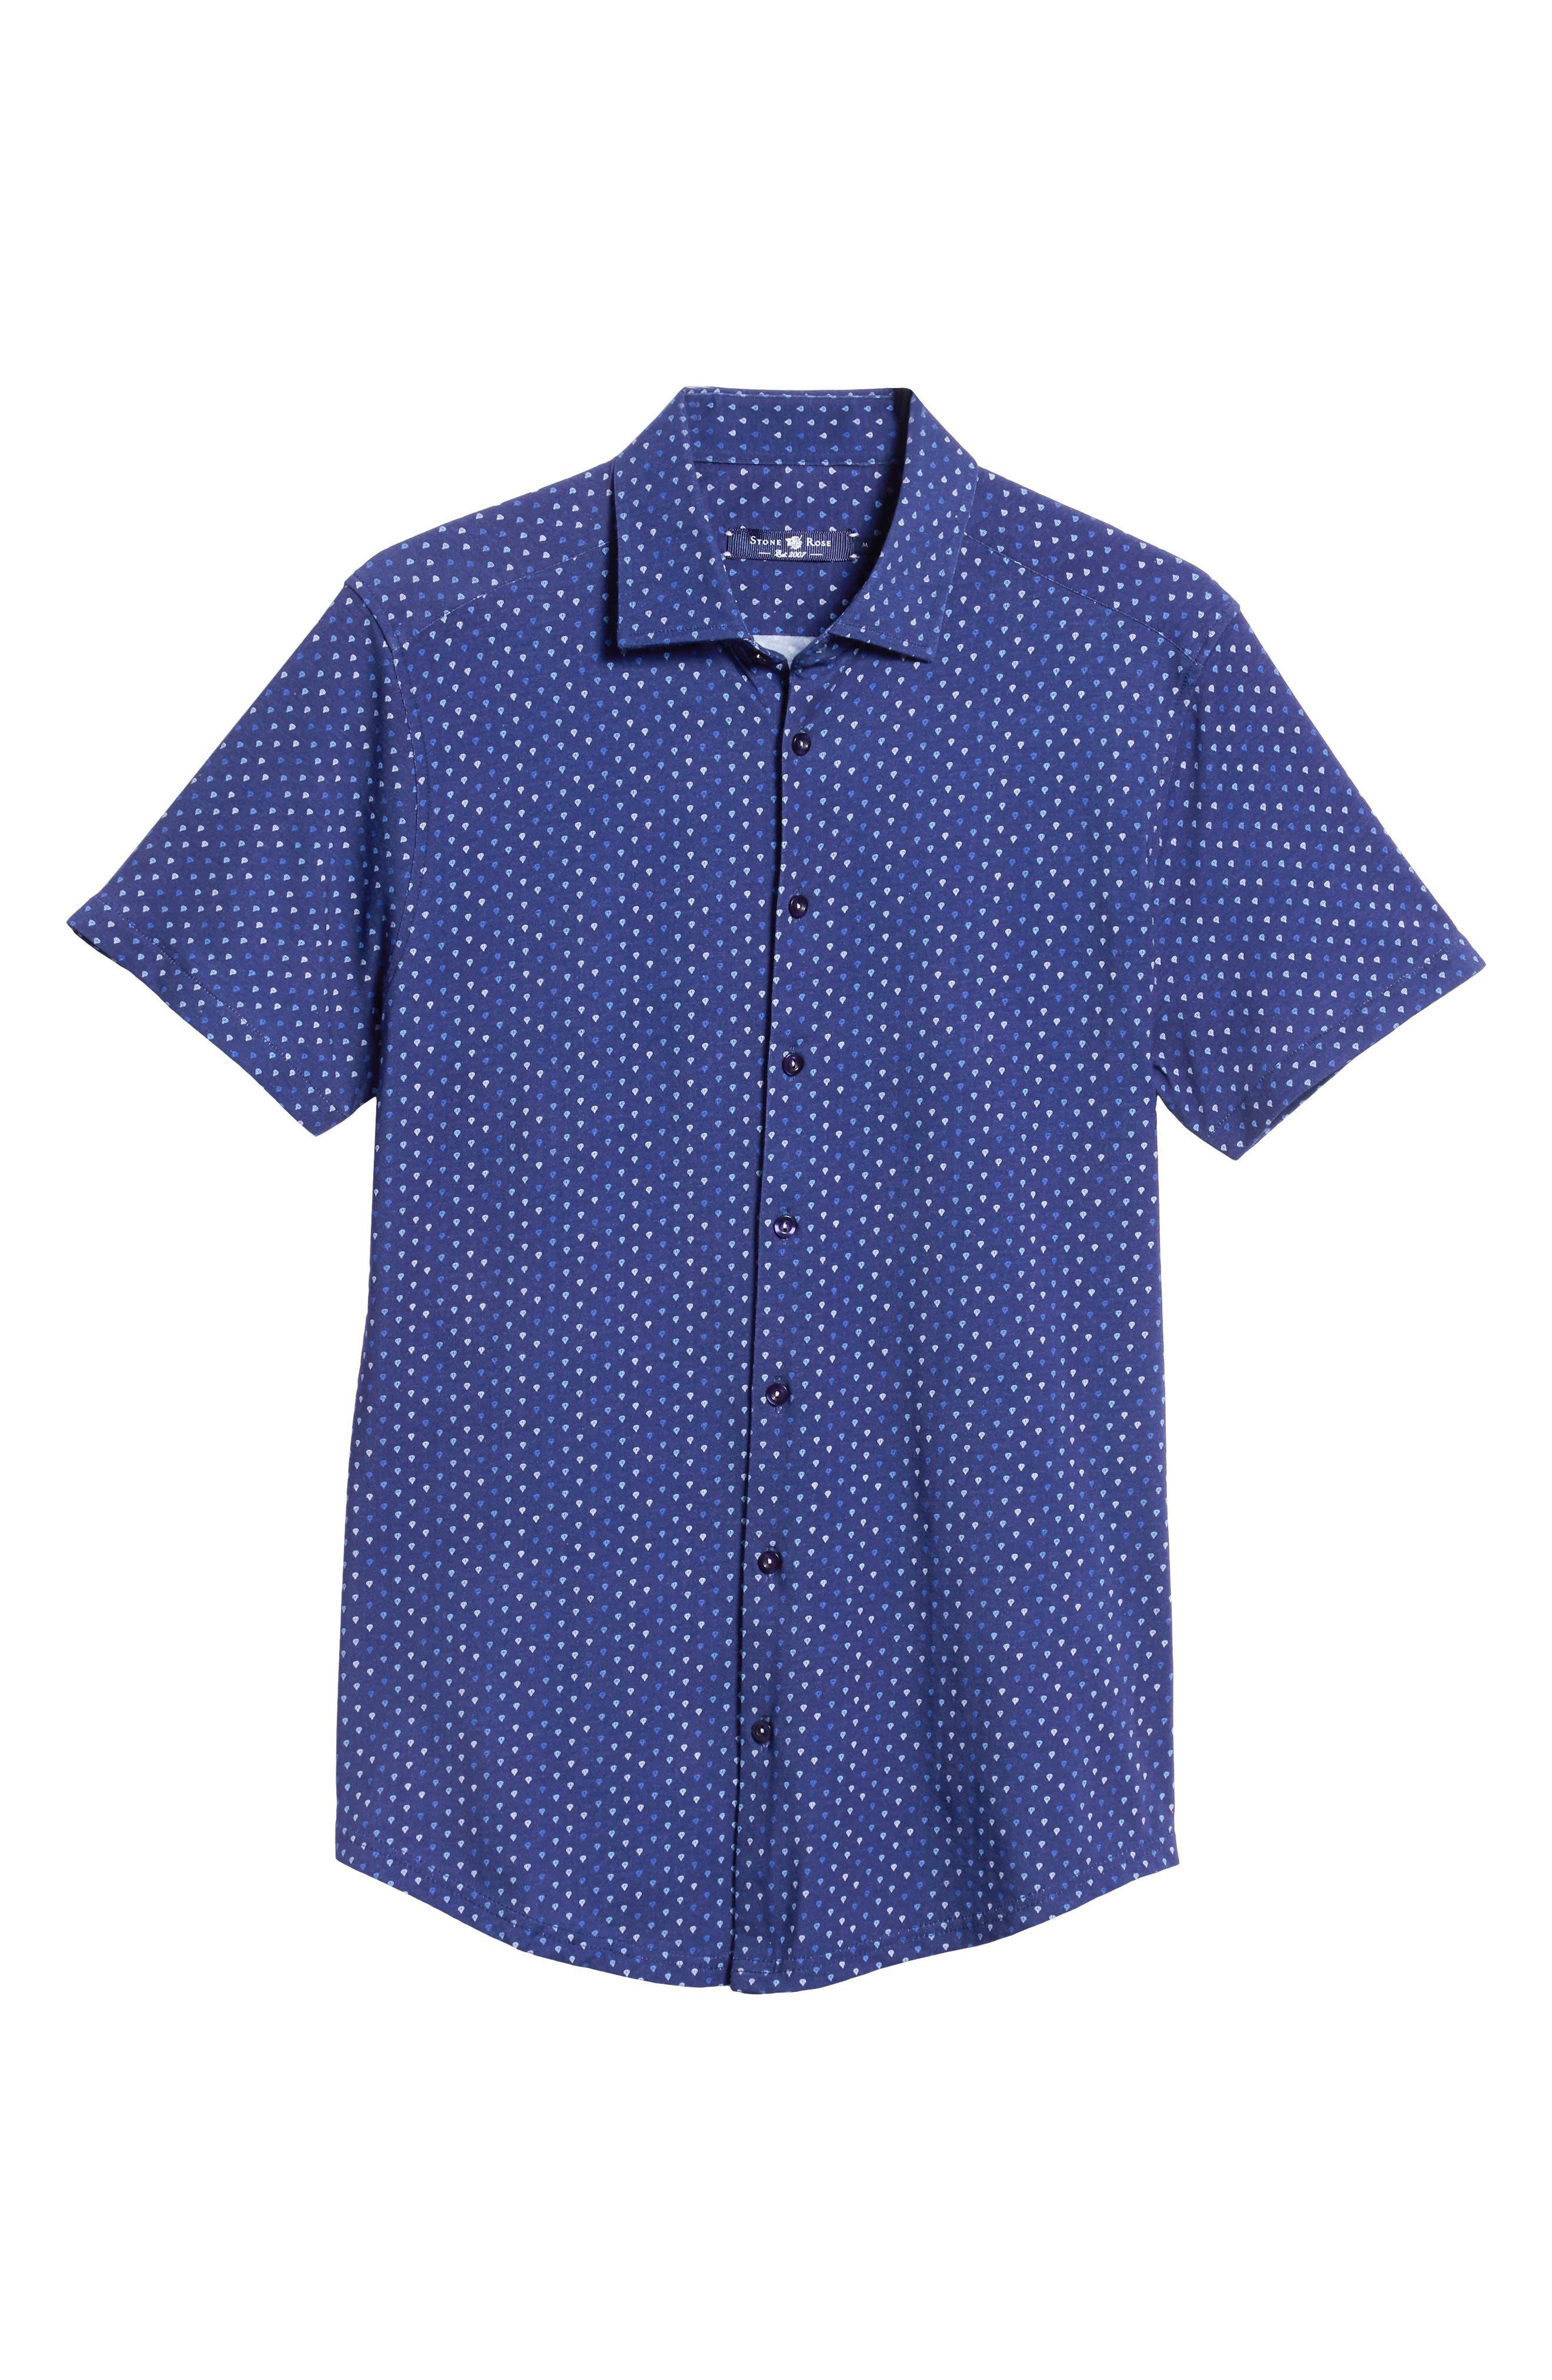 Regular Fit Sport Shirt,                             Alternate thumbnail 5, color,                             NAVY